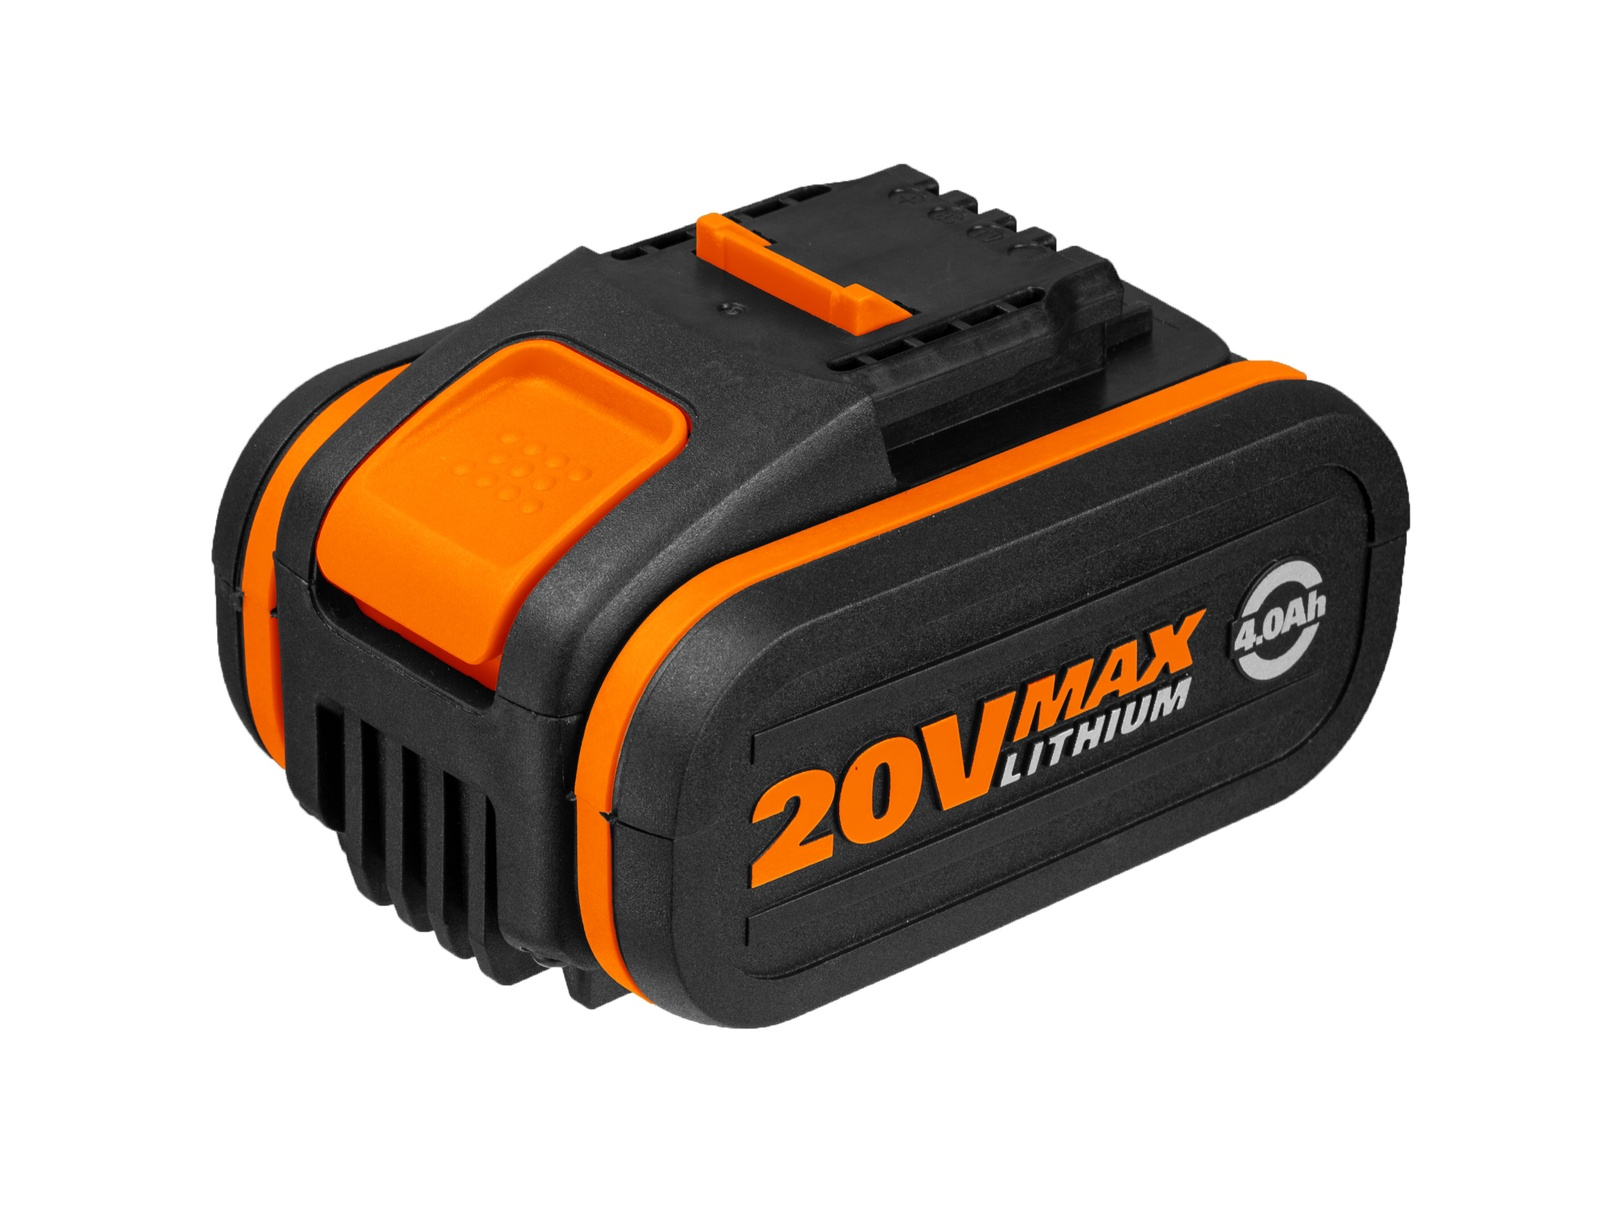 Аккумулятор для инструмента WORX WA3553 аккумуляторы для автомобиля 65 а ч цена братск